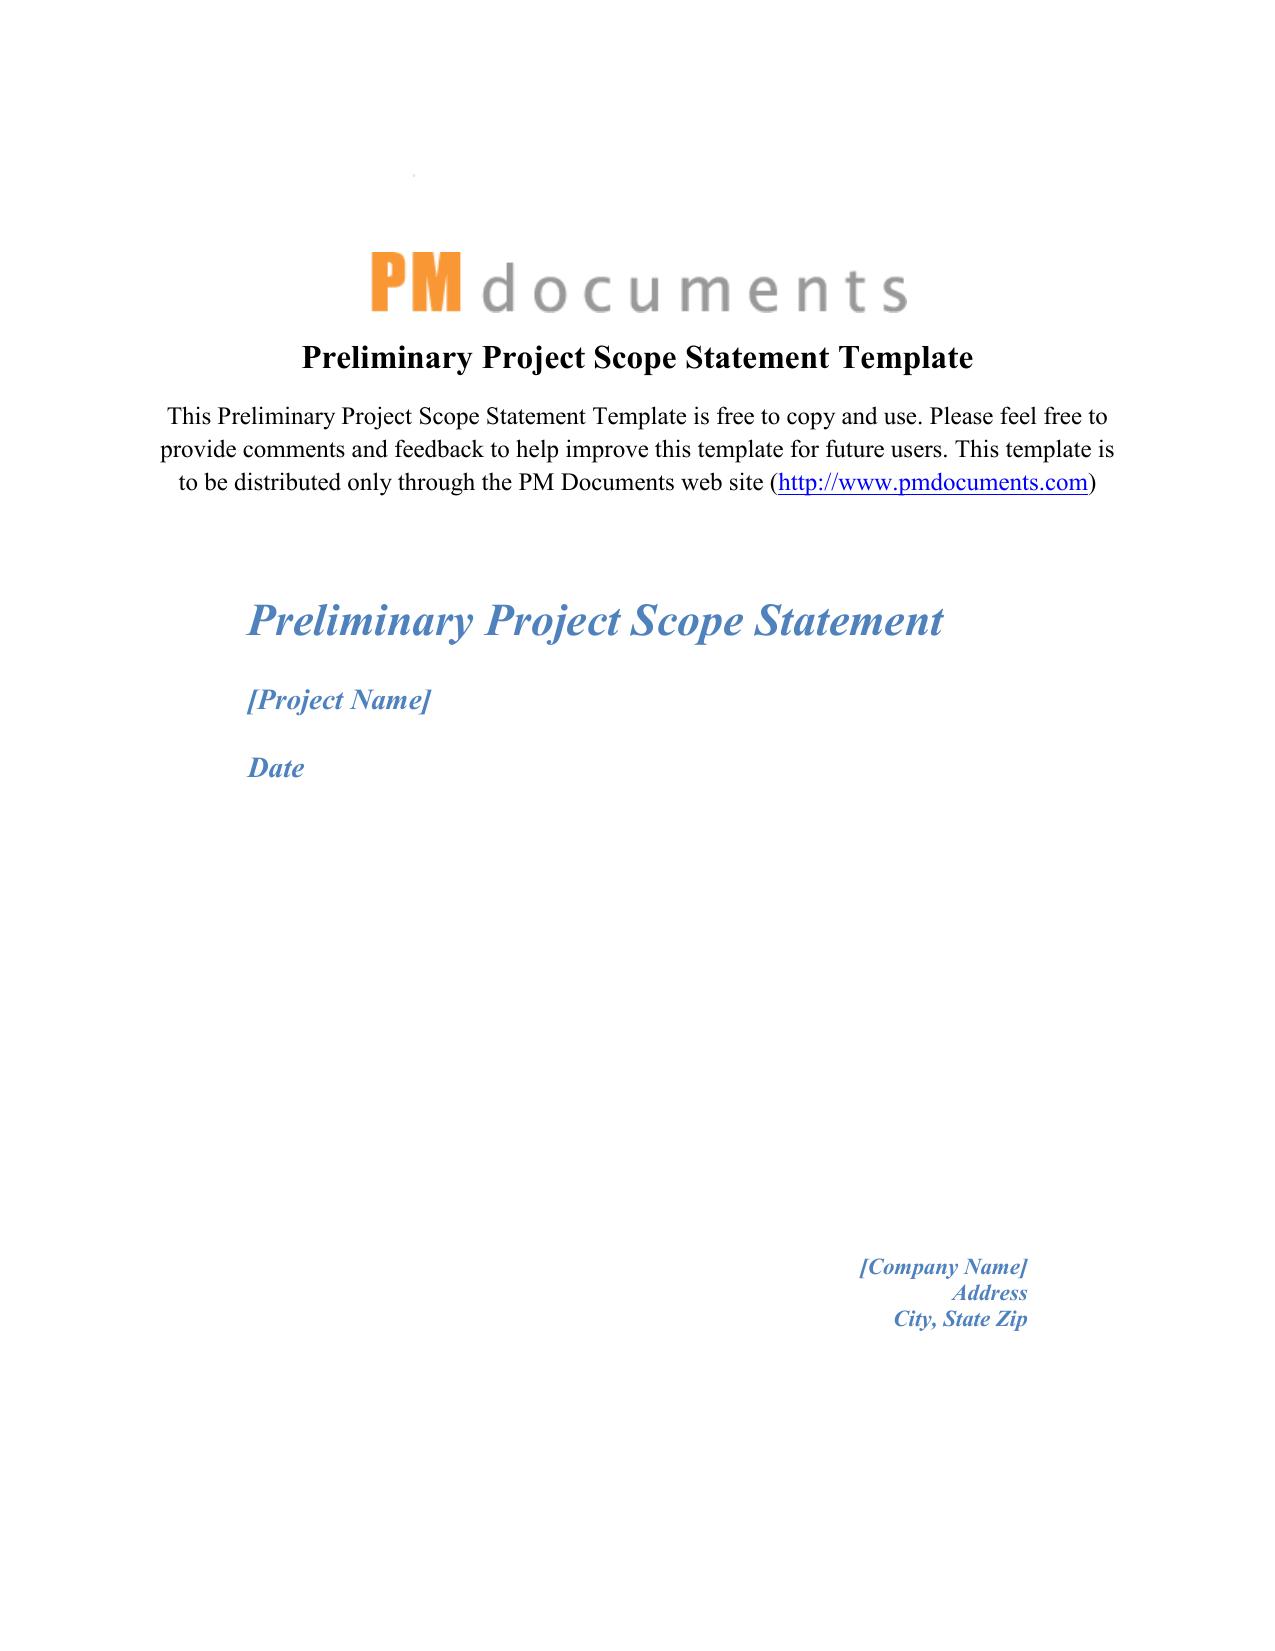 Preliminary project scope statement template maxwellsz